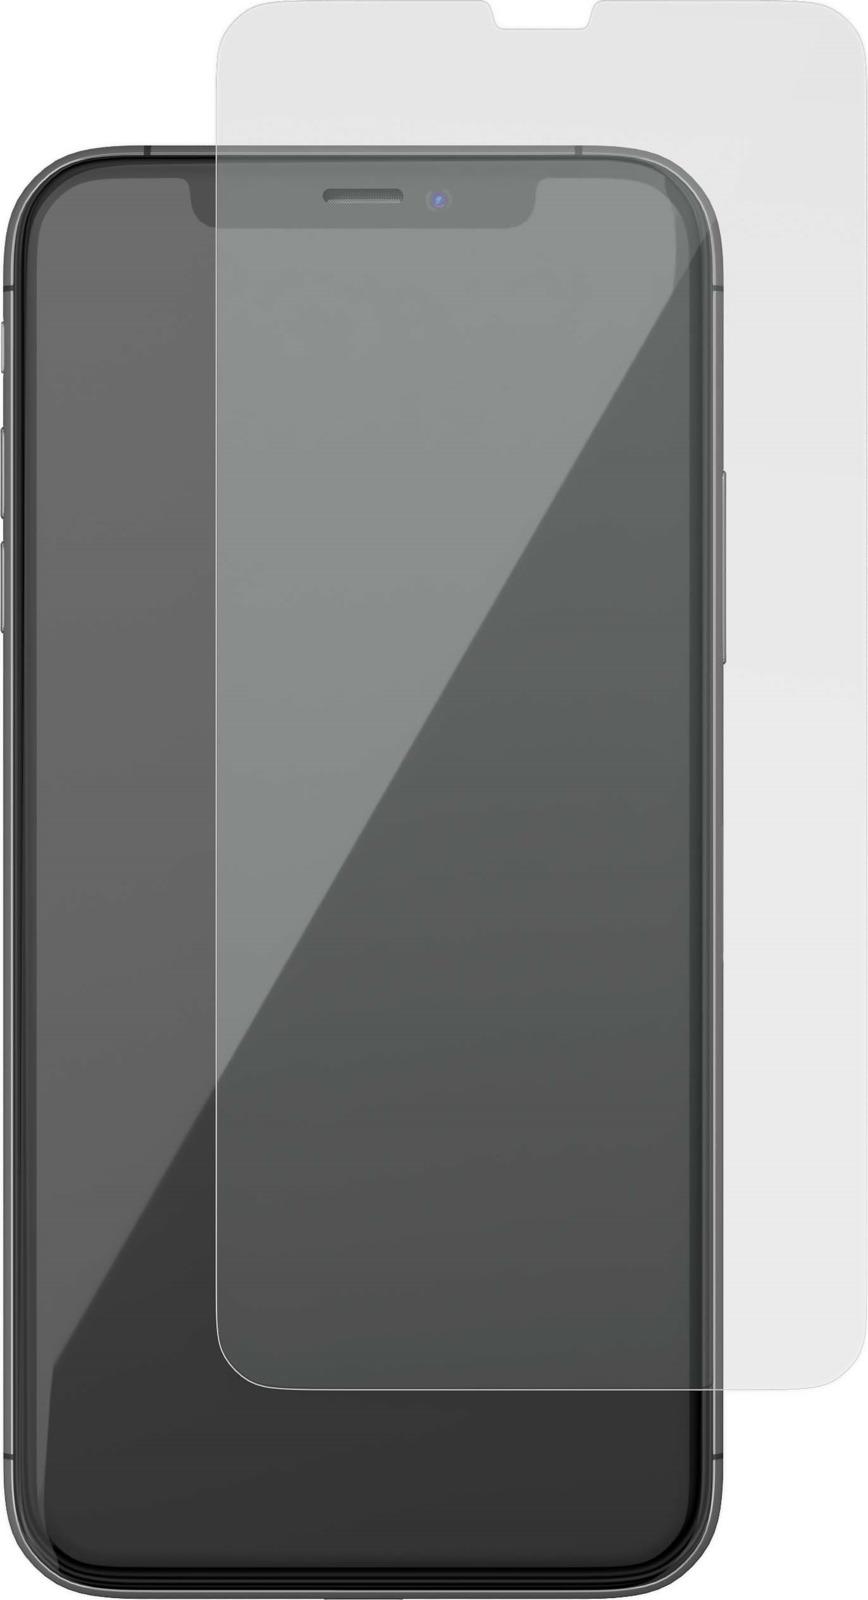 Защитное стекло uBear Premium Glass Screen Protector 0,3 мм для Apple iPhone XS, прозрачный glare free screen protector with cleaning cloth for iphone 3g